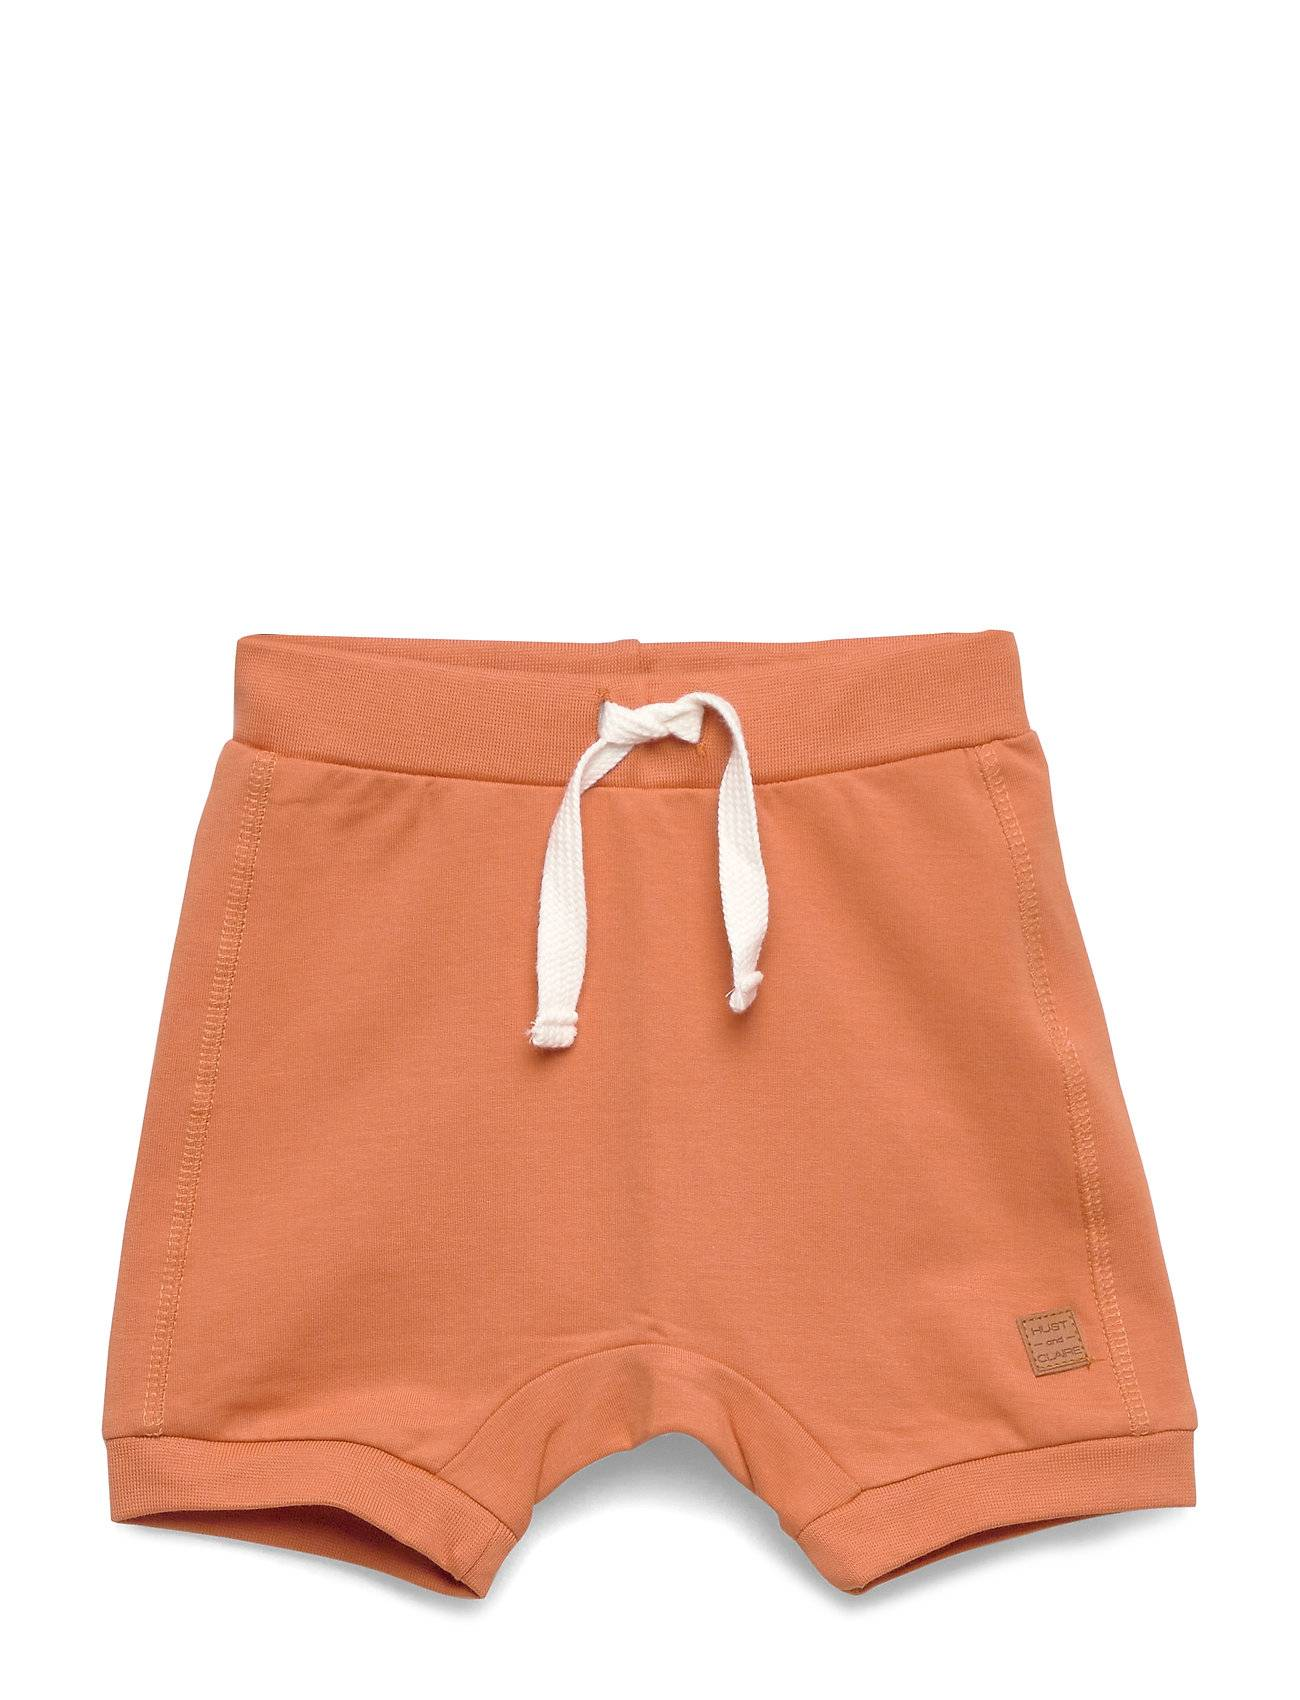 Hust & Claire Hubert - Shorts Shortsit Oranssi Hust & Claire